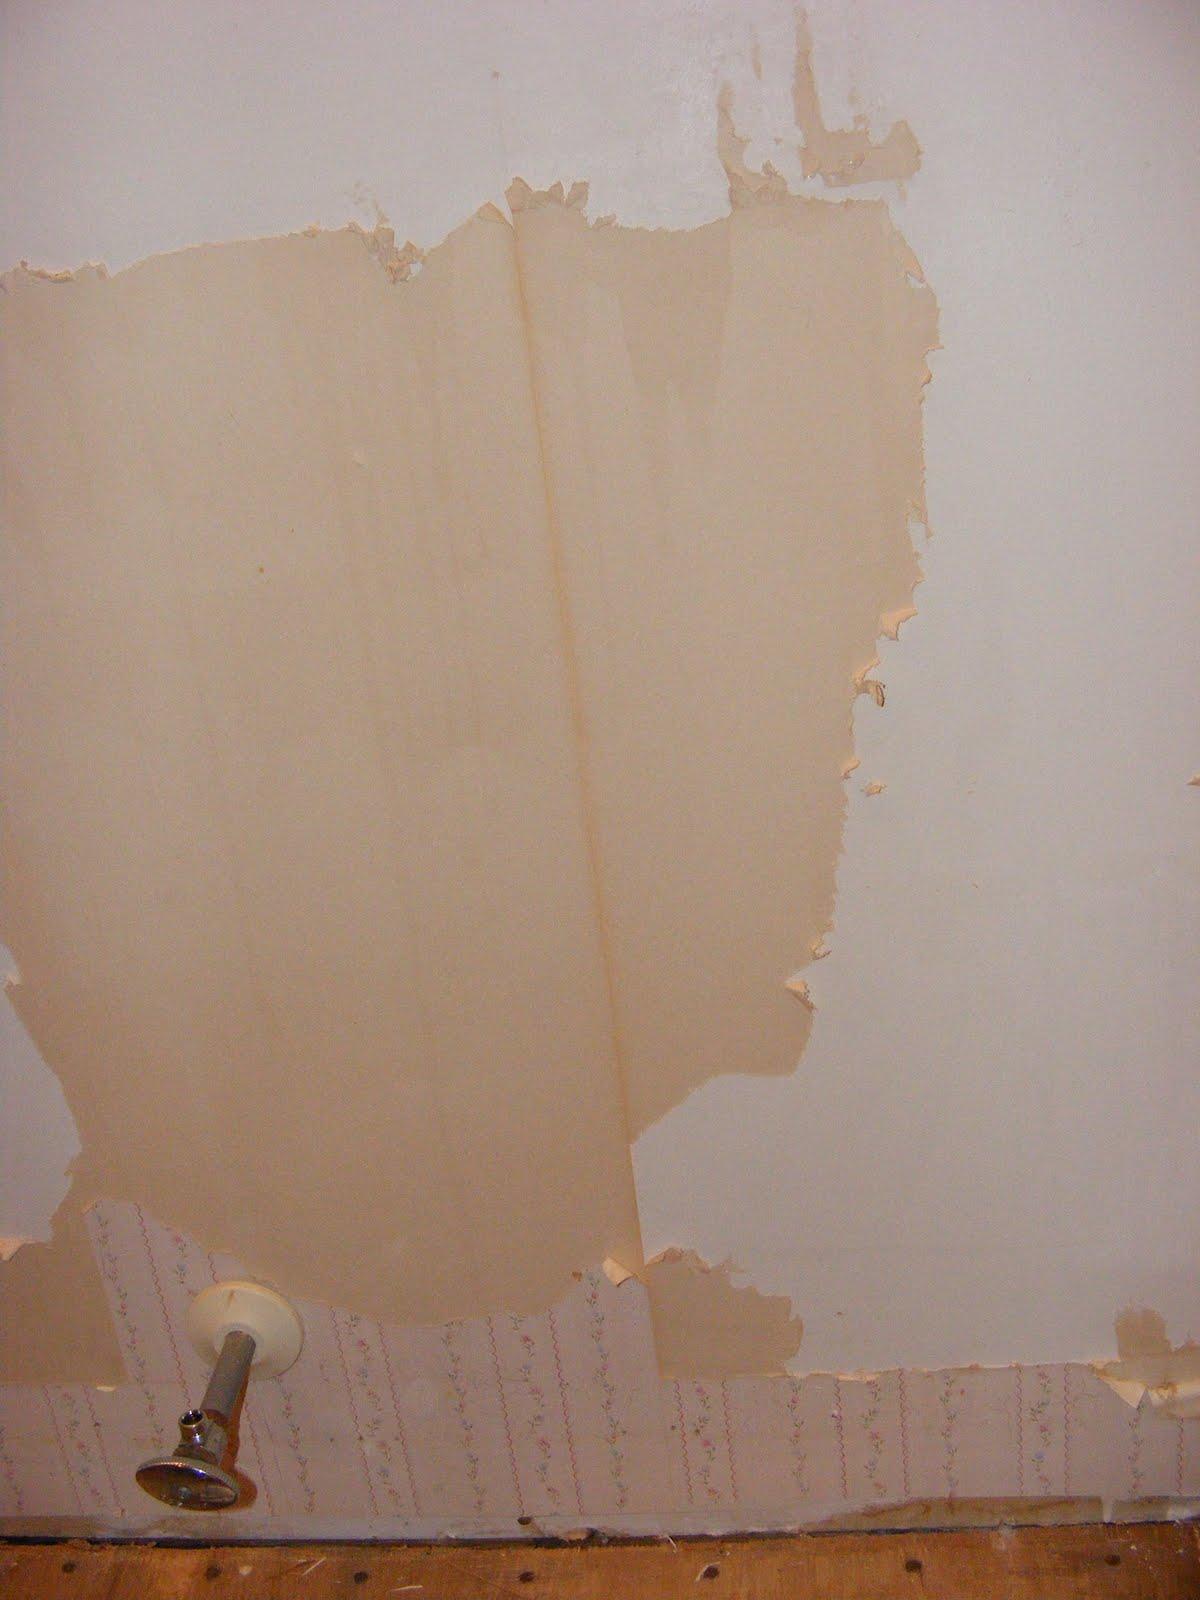 fabric softener wallpaper removal downy fabric softener wallpaper 1200x1600